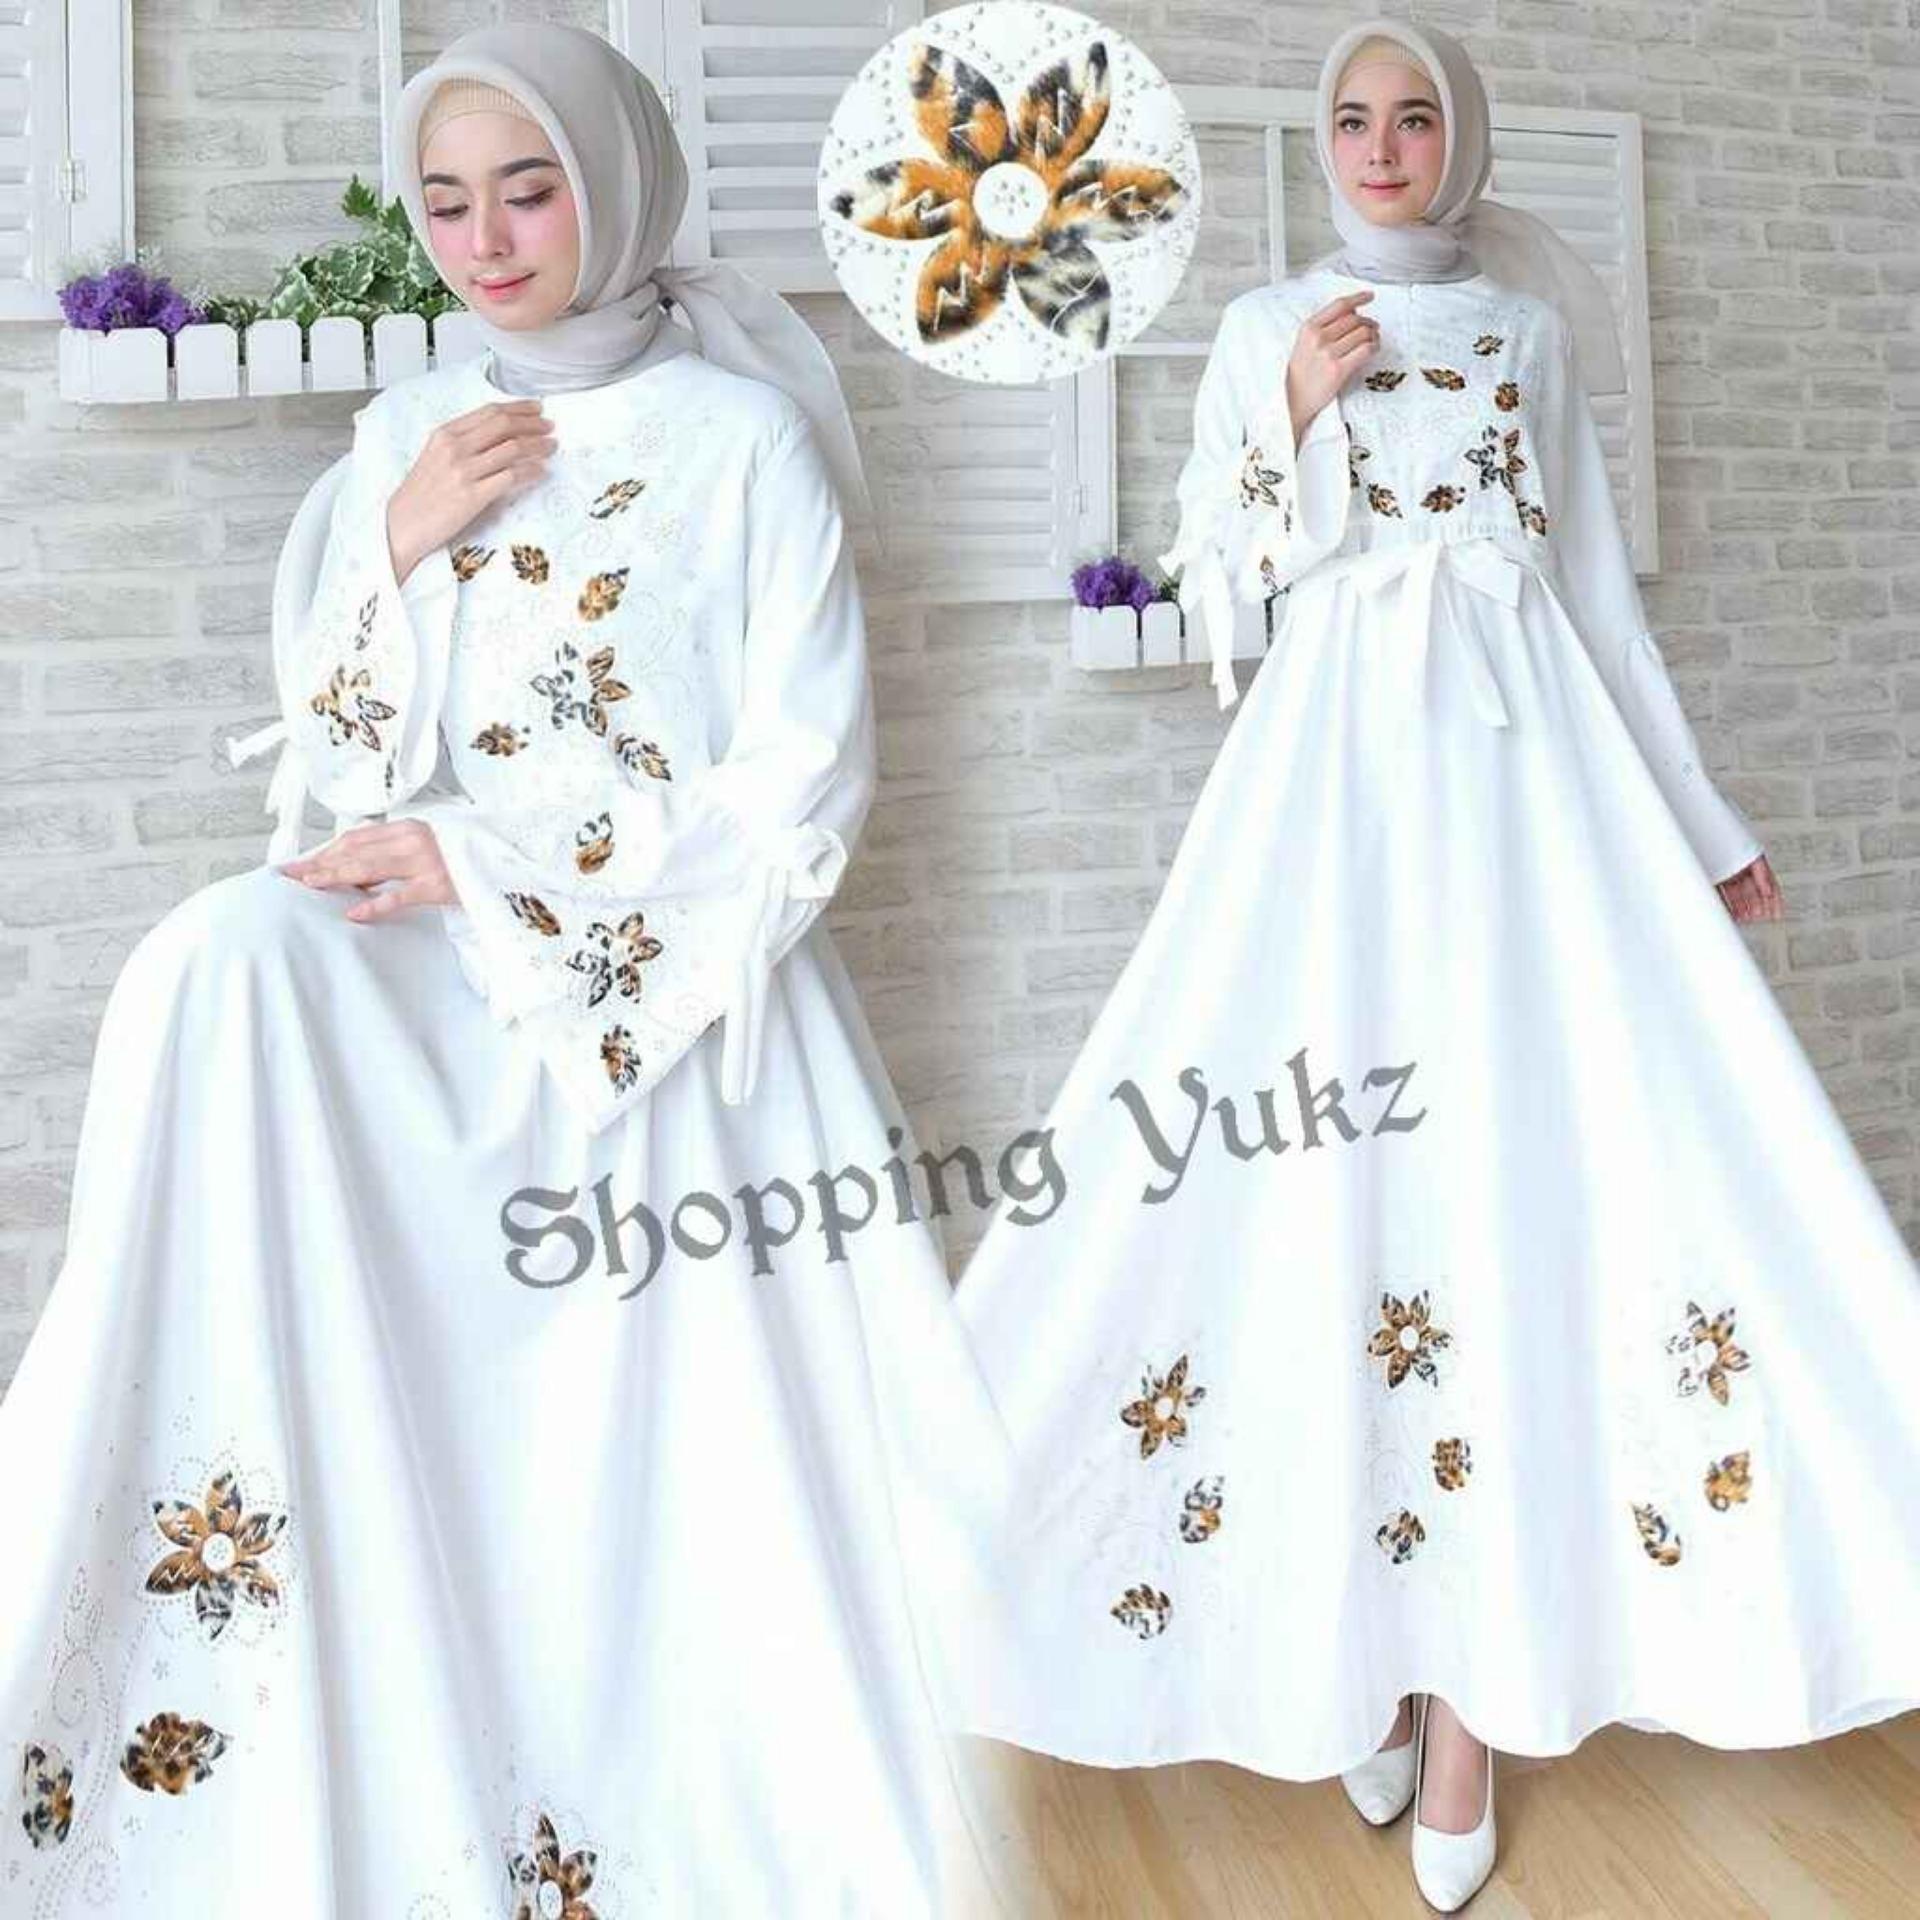 Shopping Yukz Baju Gamis Dress Muslim Syari Wanita MAXI FLOWER PUTIH ( Tanpa Jilbab ) / Hijab Muslimah / Baju Muslimah Wanita / Syari Syari'i Muslim / Gaun Muslim / Long Dress Muslimah Wanita